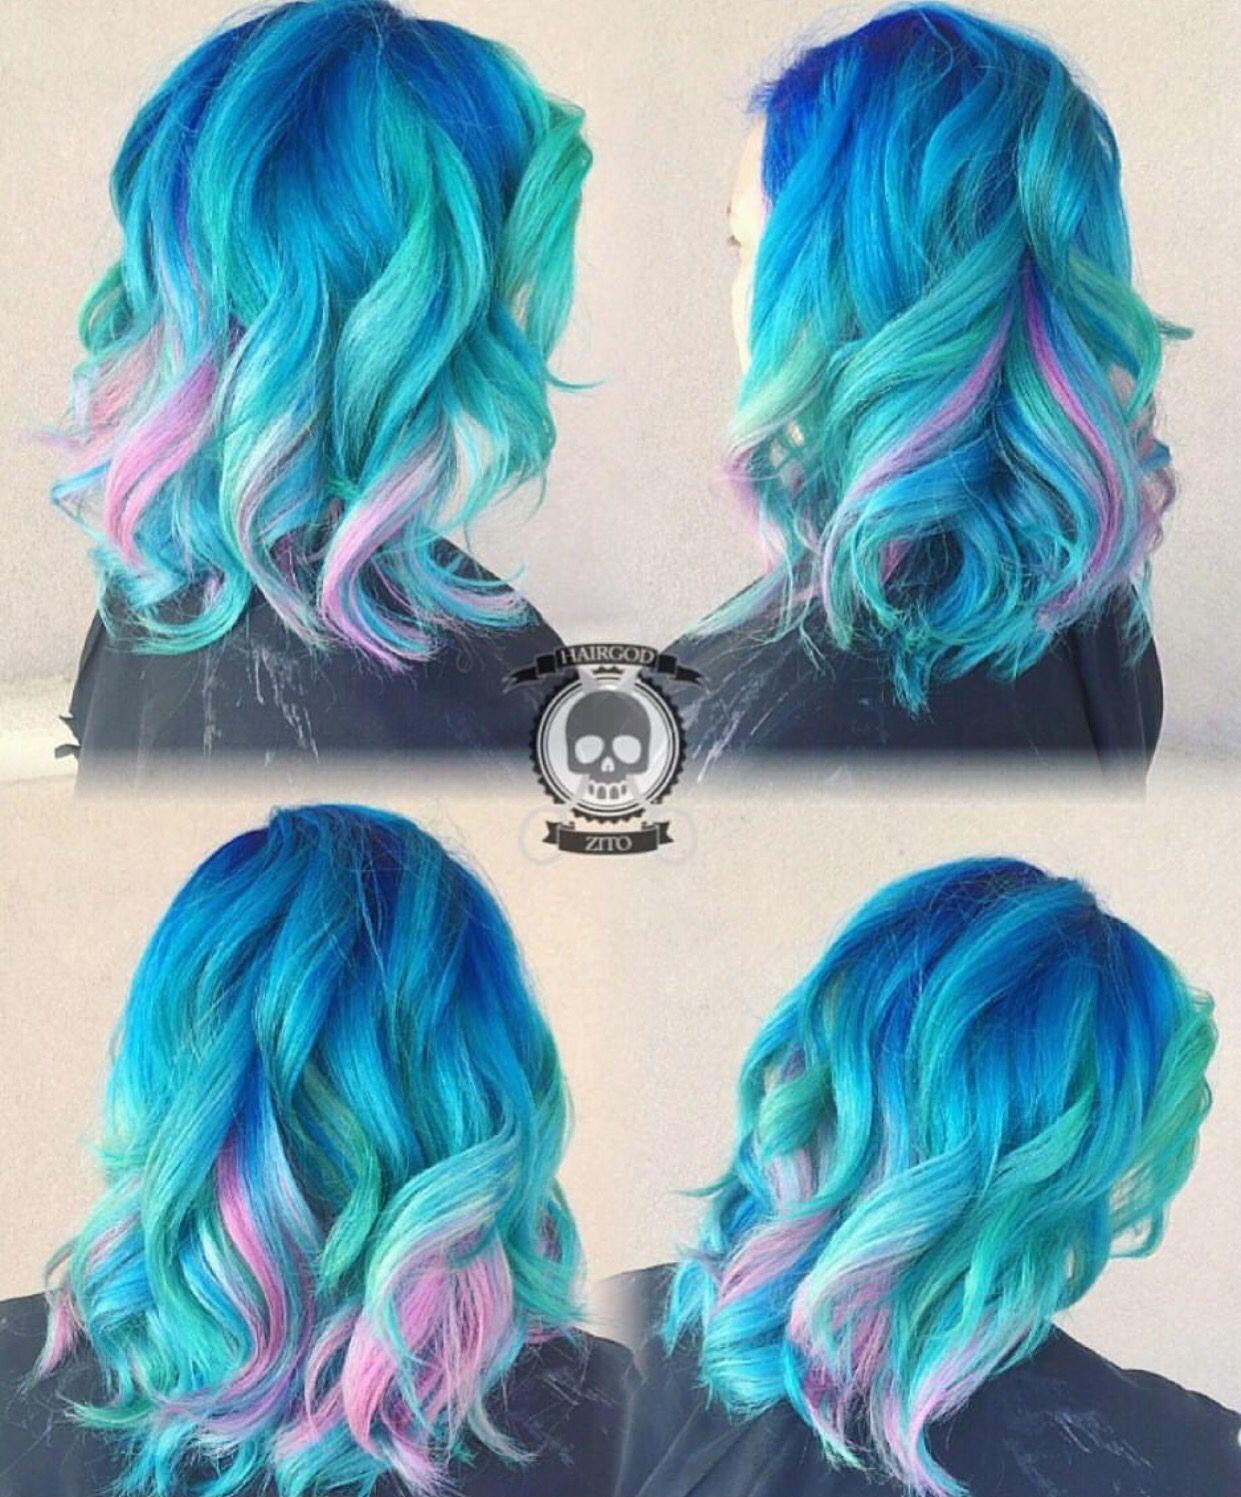 Mermaid hair color by rickey zito blue hair turquoise hair pink hair